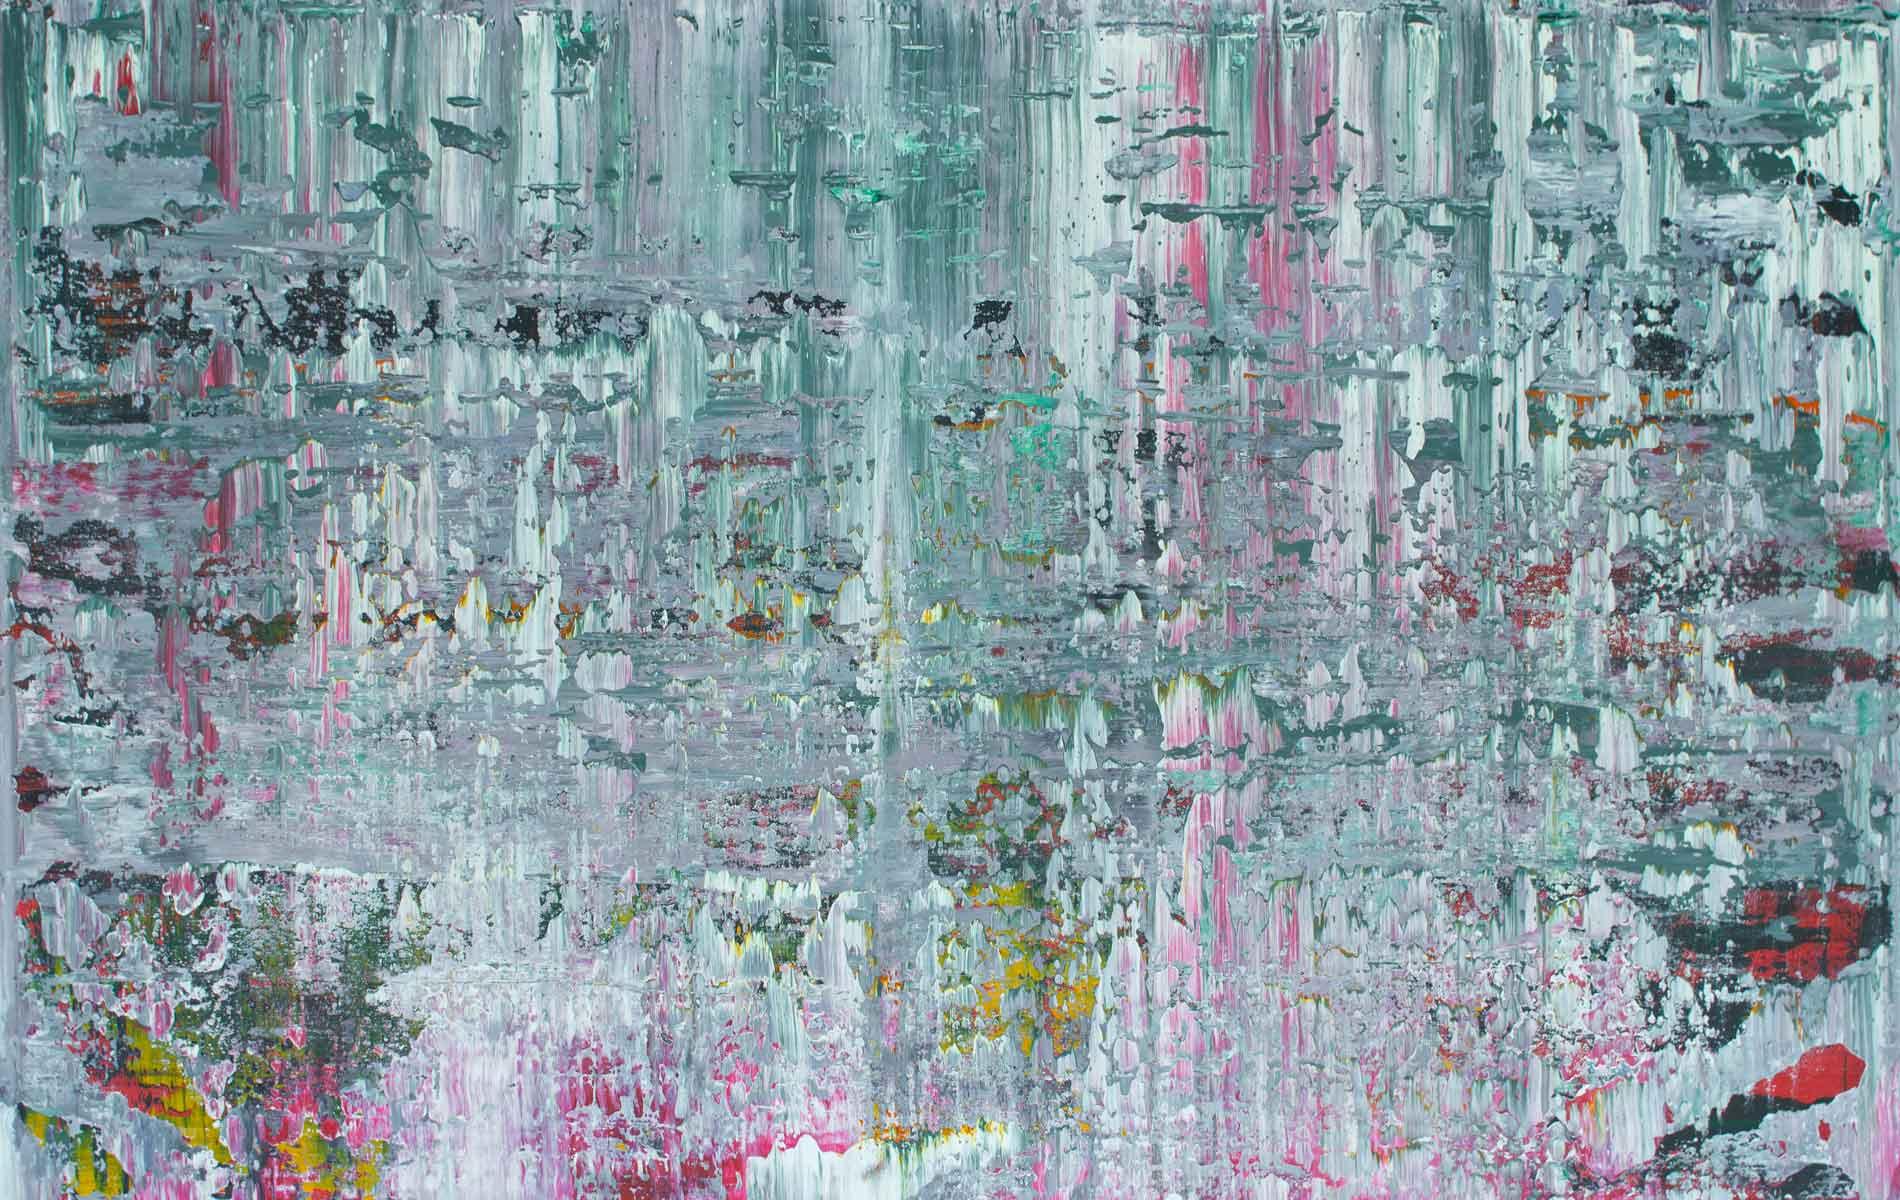 Patio, 2014, Acrylic on Canvas, 38 x 58 (SOLD)